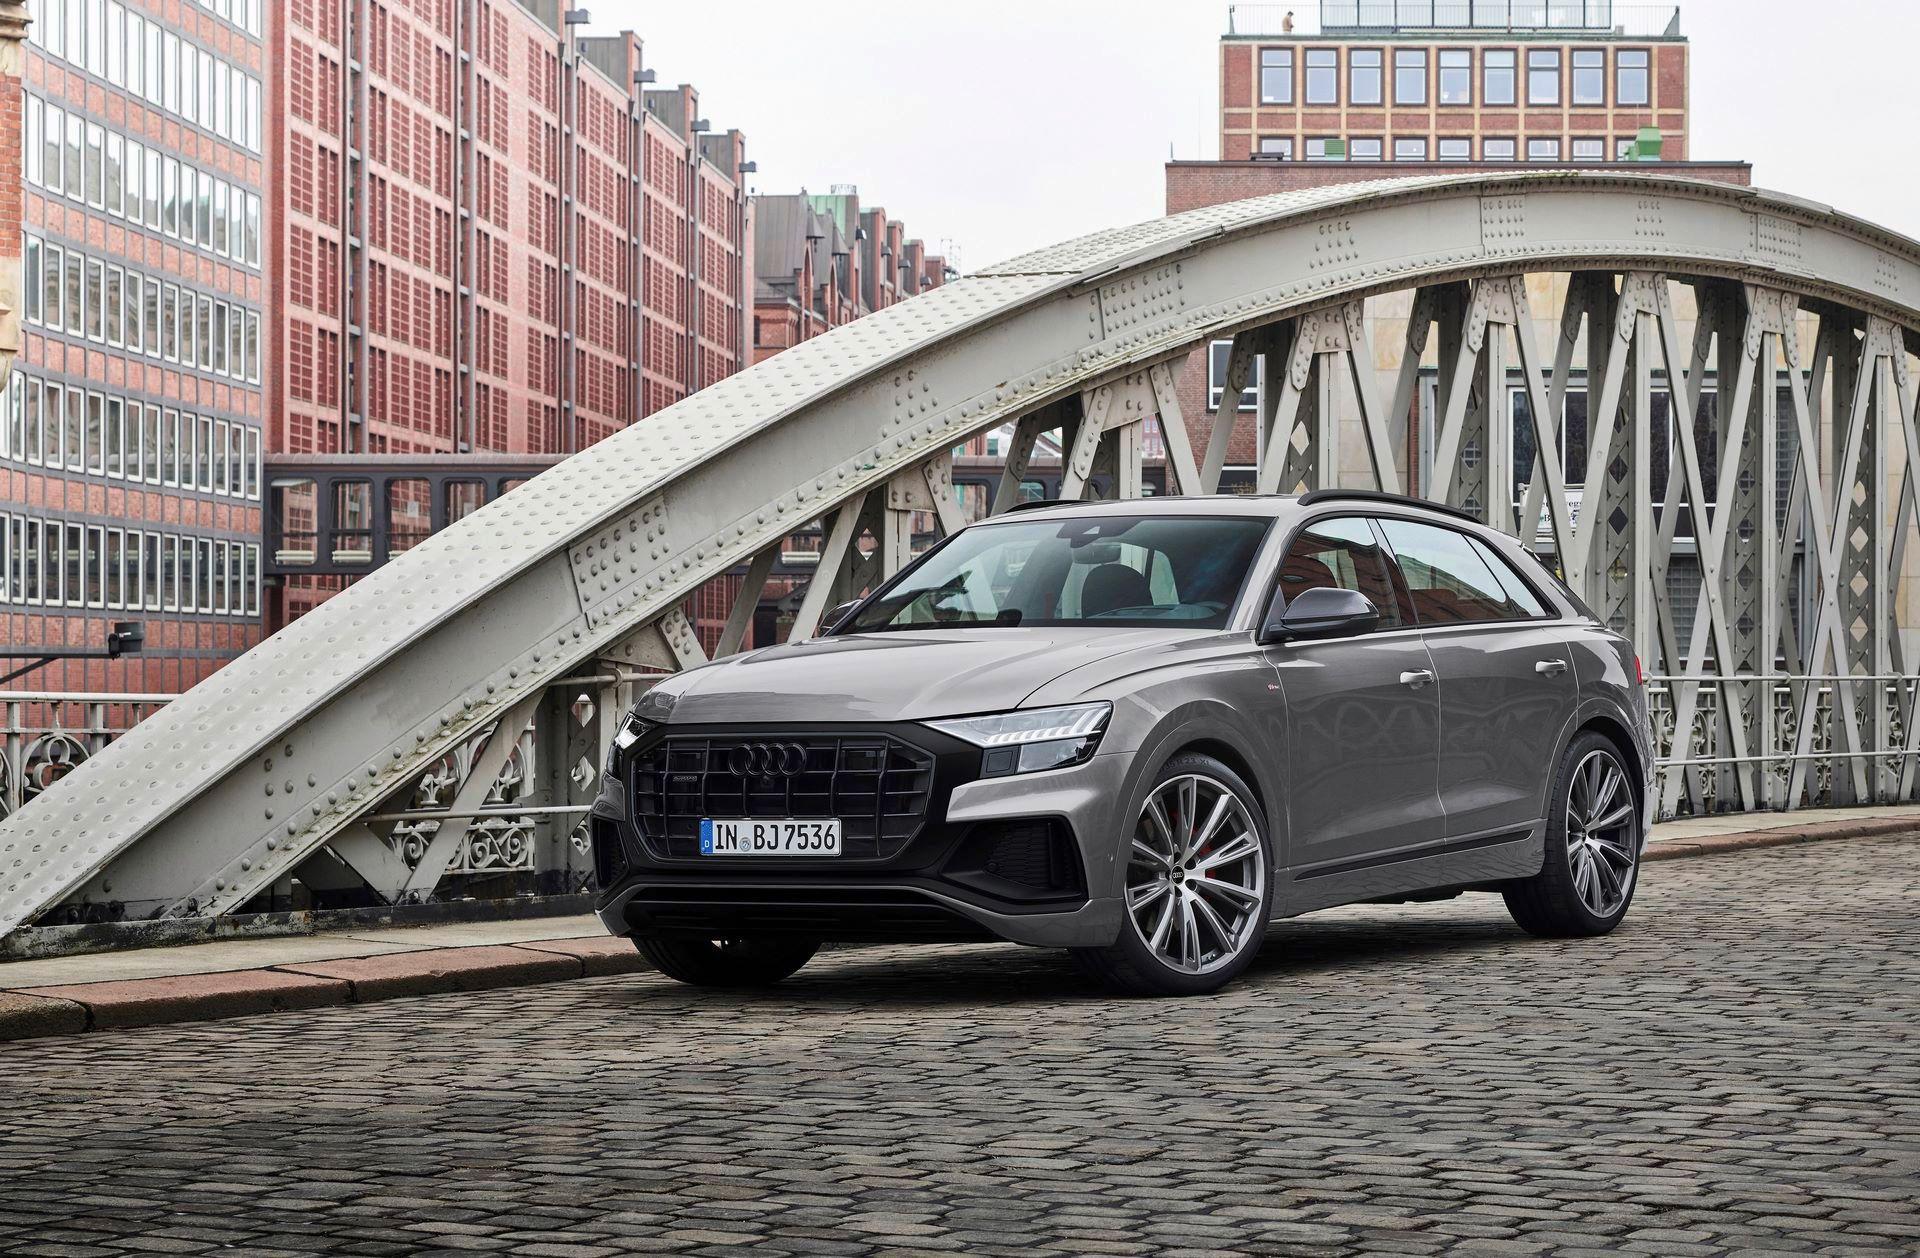 Audi-A4-A5-Q7-Q8-Competition-And-Competition-Plus-Trims-12